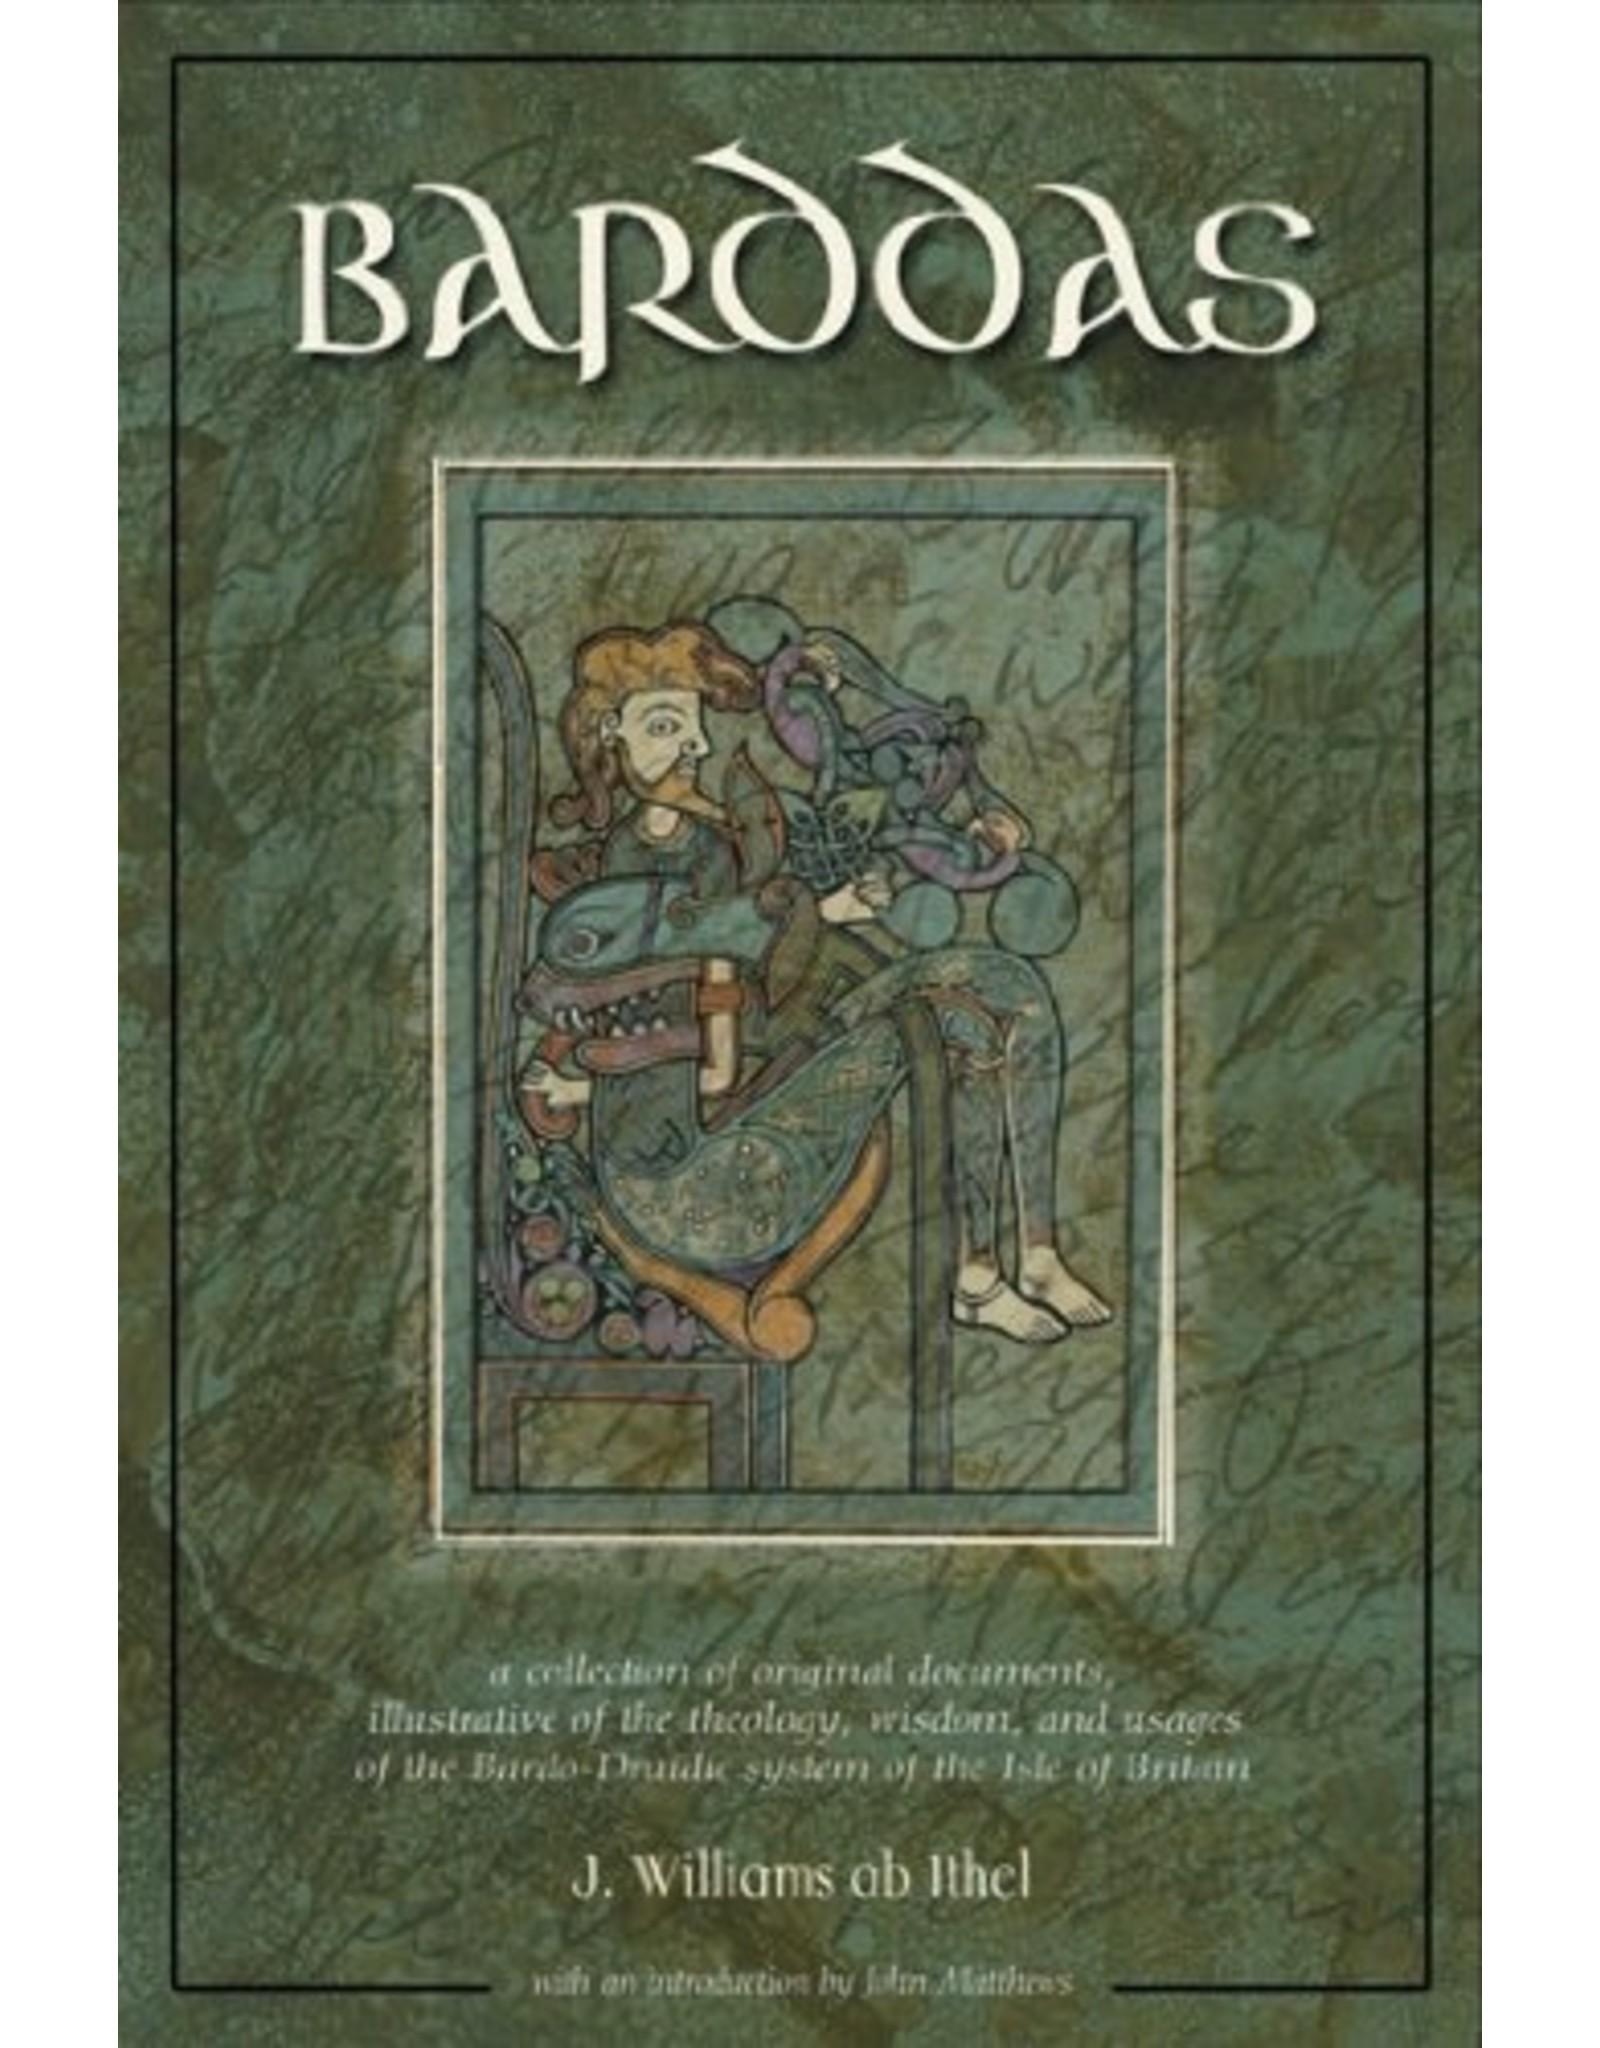 The Baddas of Iolo Morganwg